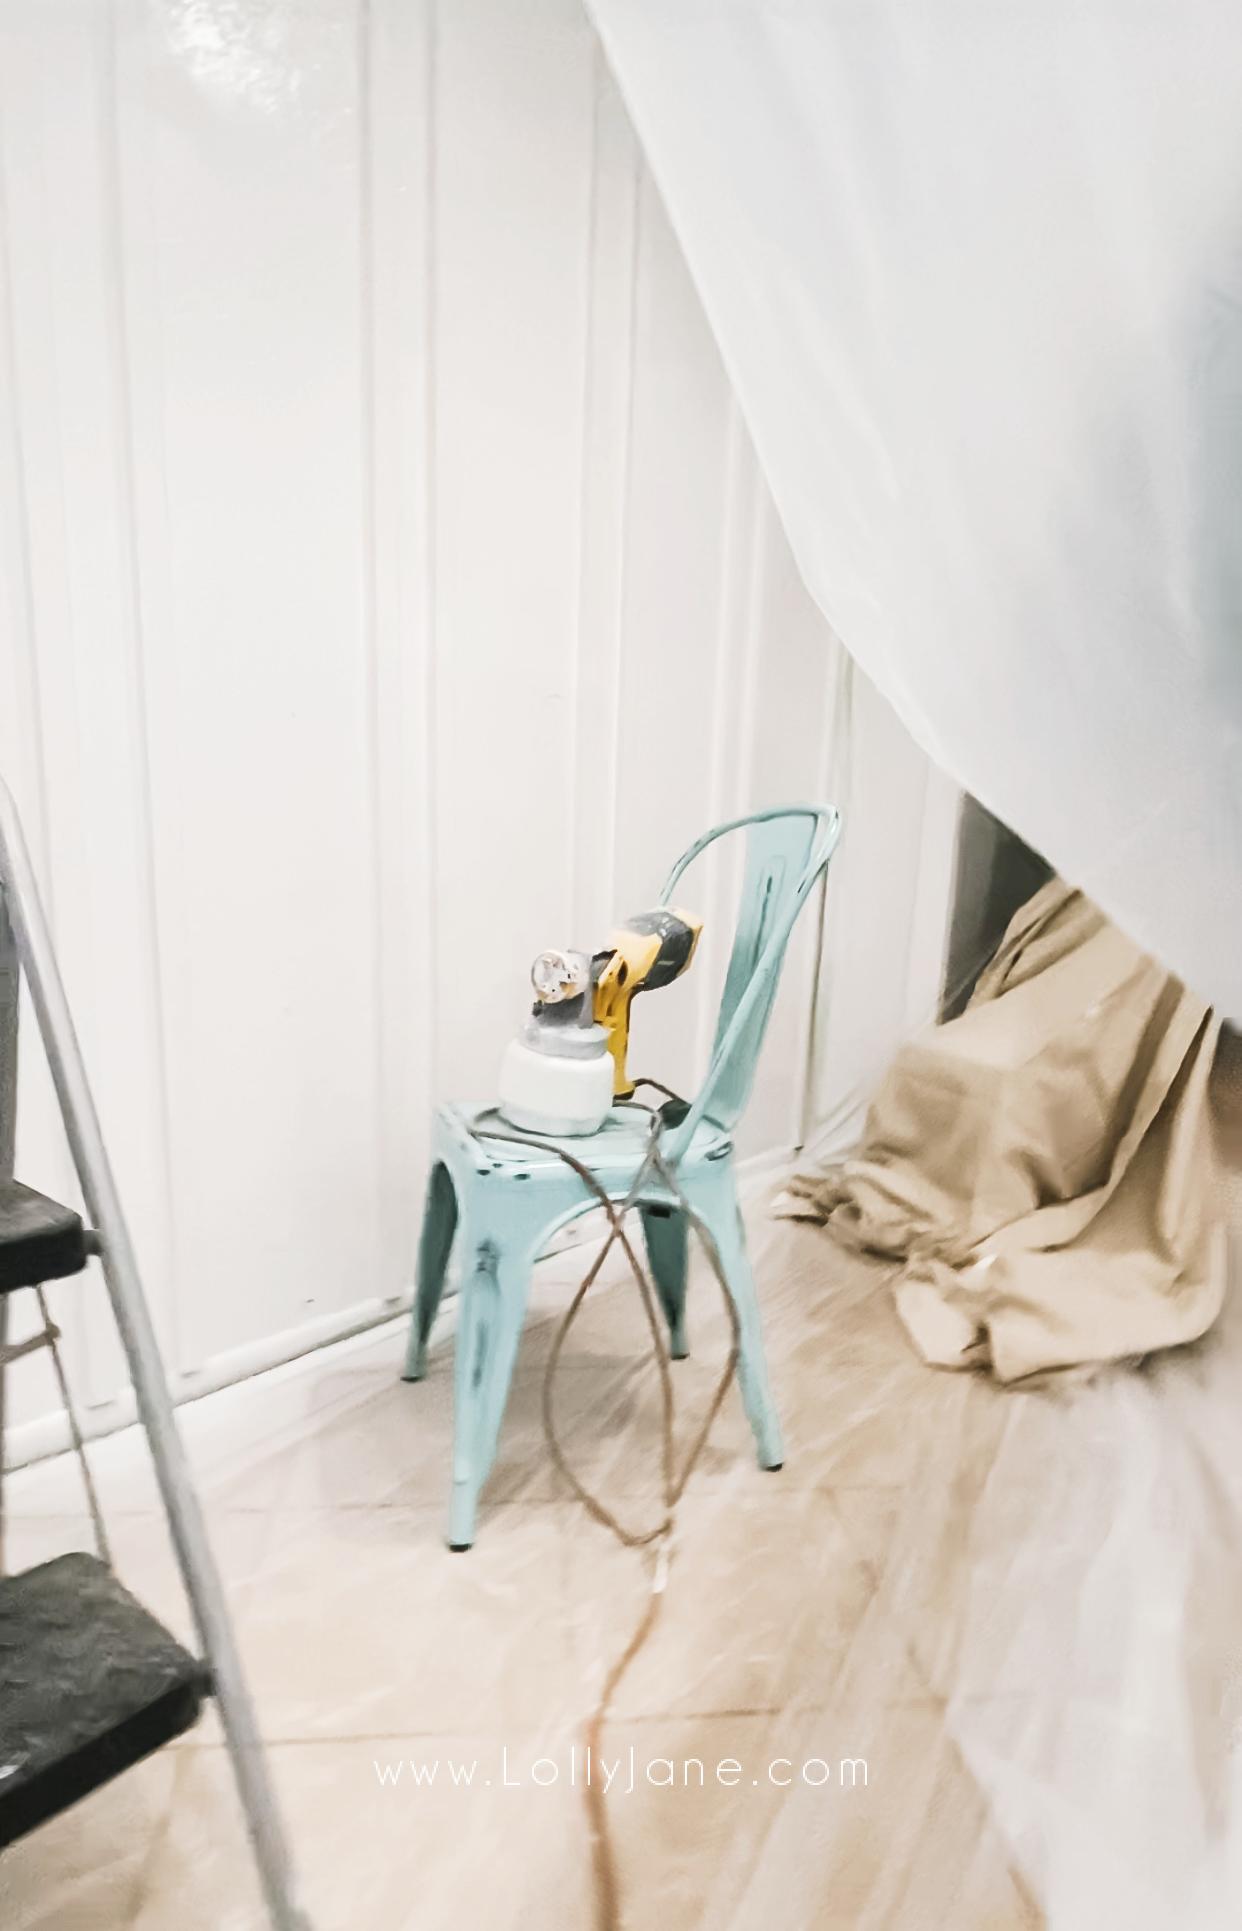 Check out this easy to install double batten wall treatment, such a pretty wall idea! #bohostyledecor #bohofarmhousedecor #howtoinstalldoublebatten #howtoinstalldoubleboardandbatten #easytoinstallwalltreatment #cheapwalltreatment